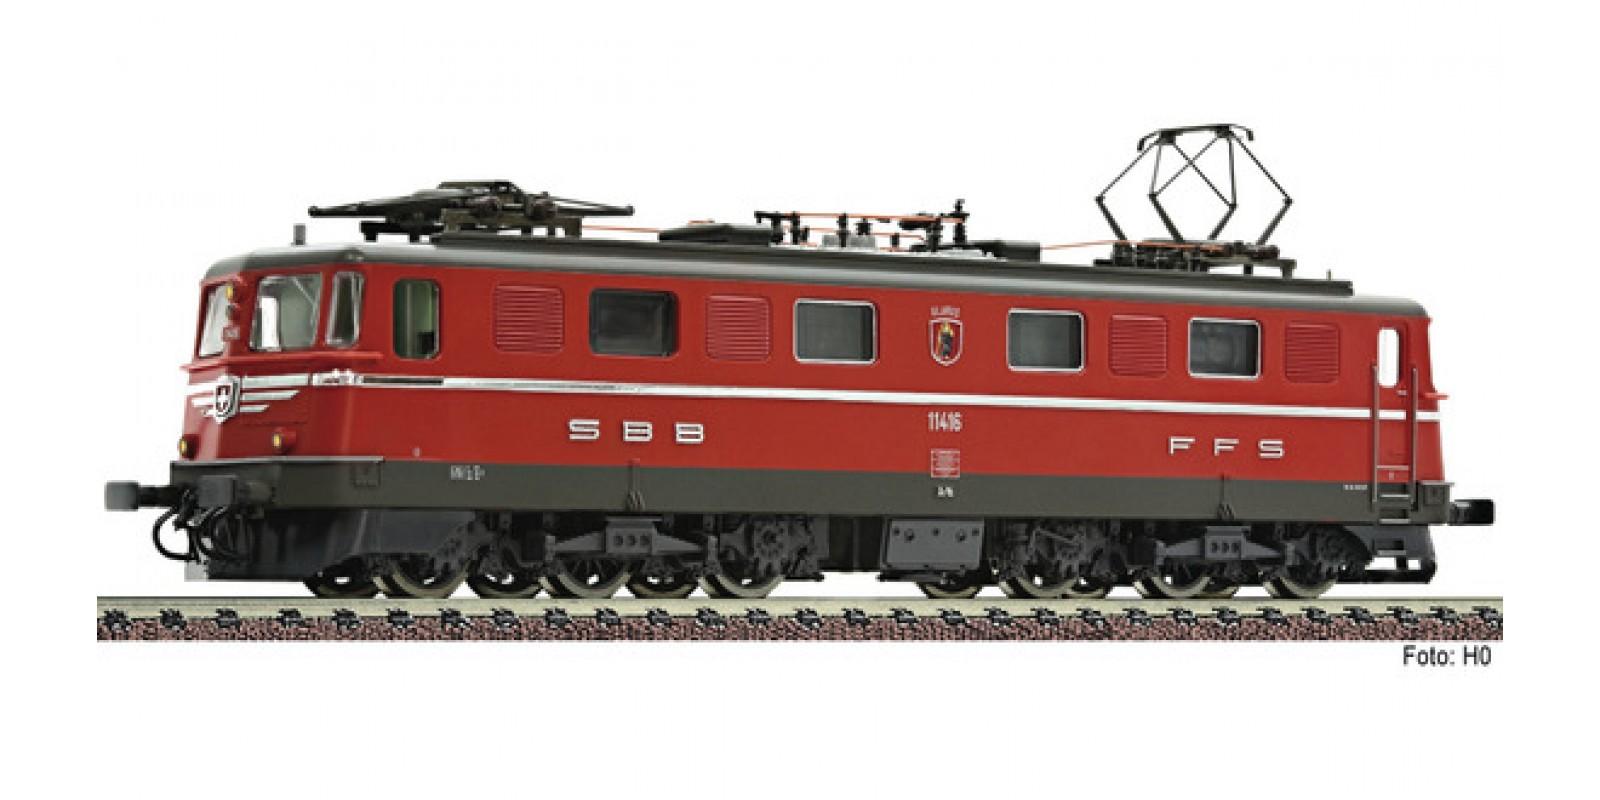 "FL737213 - Electric locomotive Ae 6/6 ""Kantonslok"", SBB"